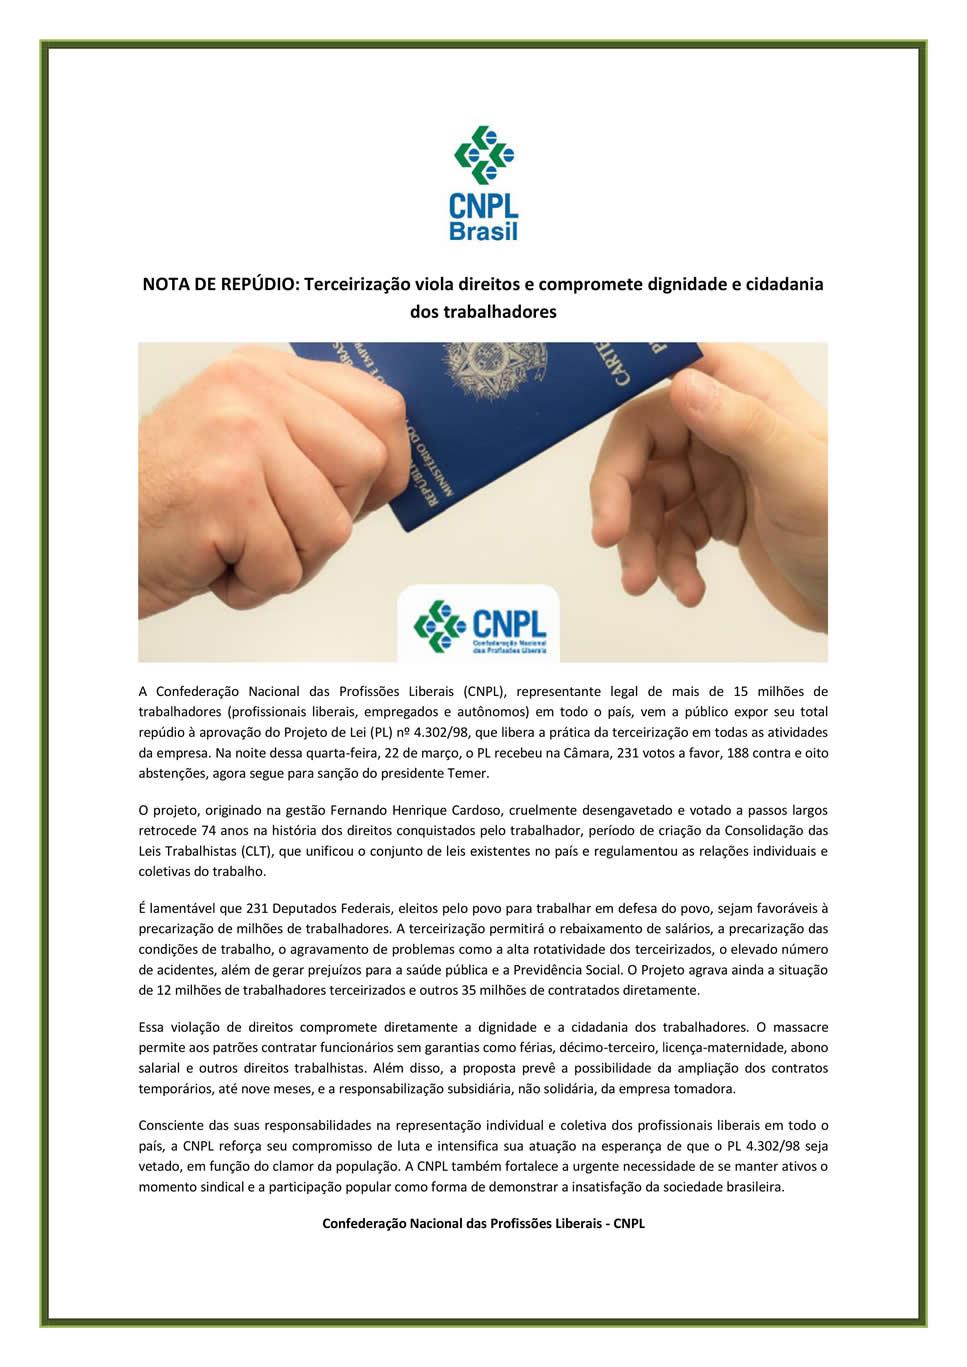 Informativo CNPL 23-03